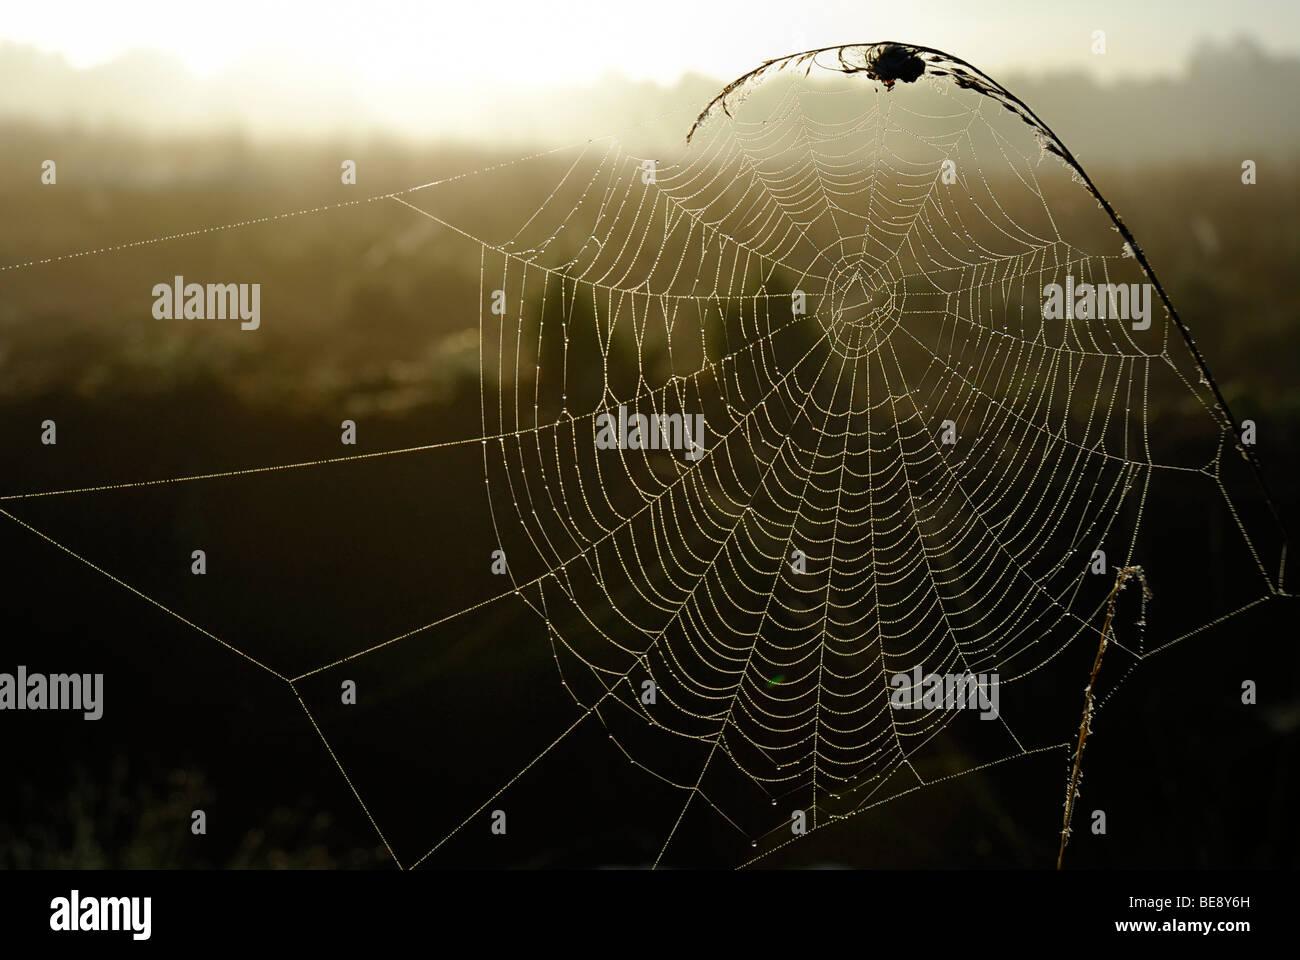 Web of an orb-web spider in backlight, Breitenburger Moor marsh, Schleswig-Holstein, Germany, Europe - Stock Image